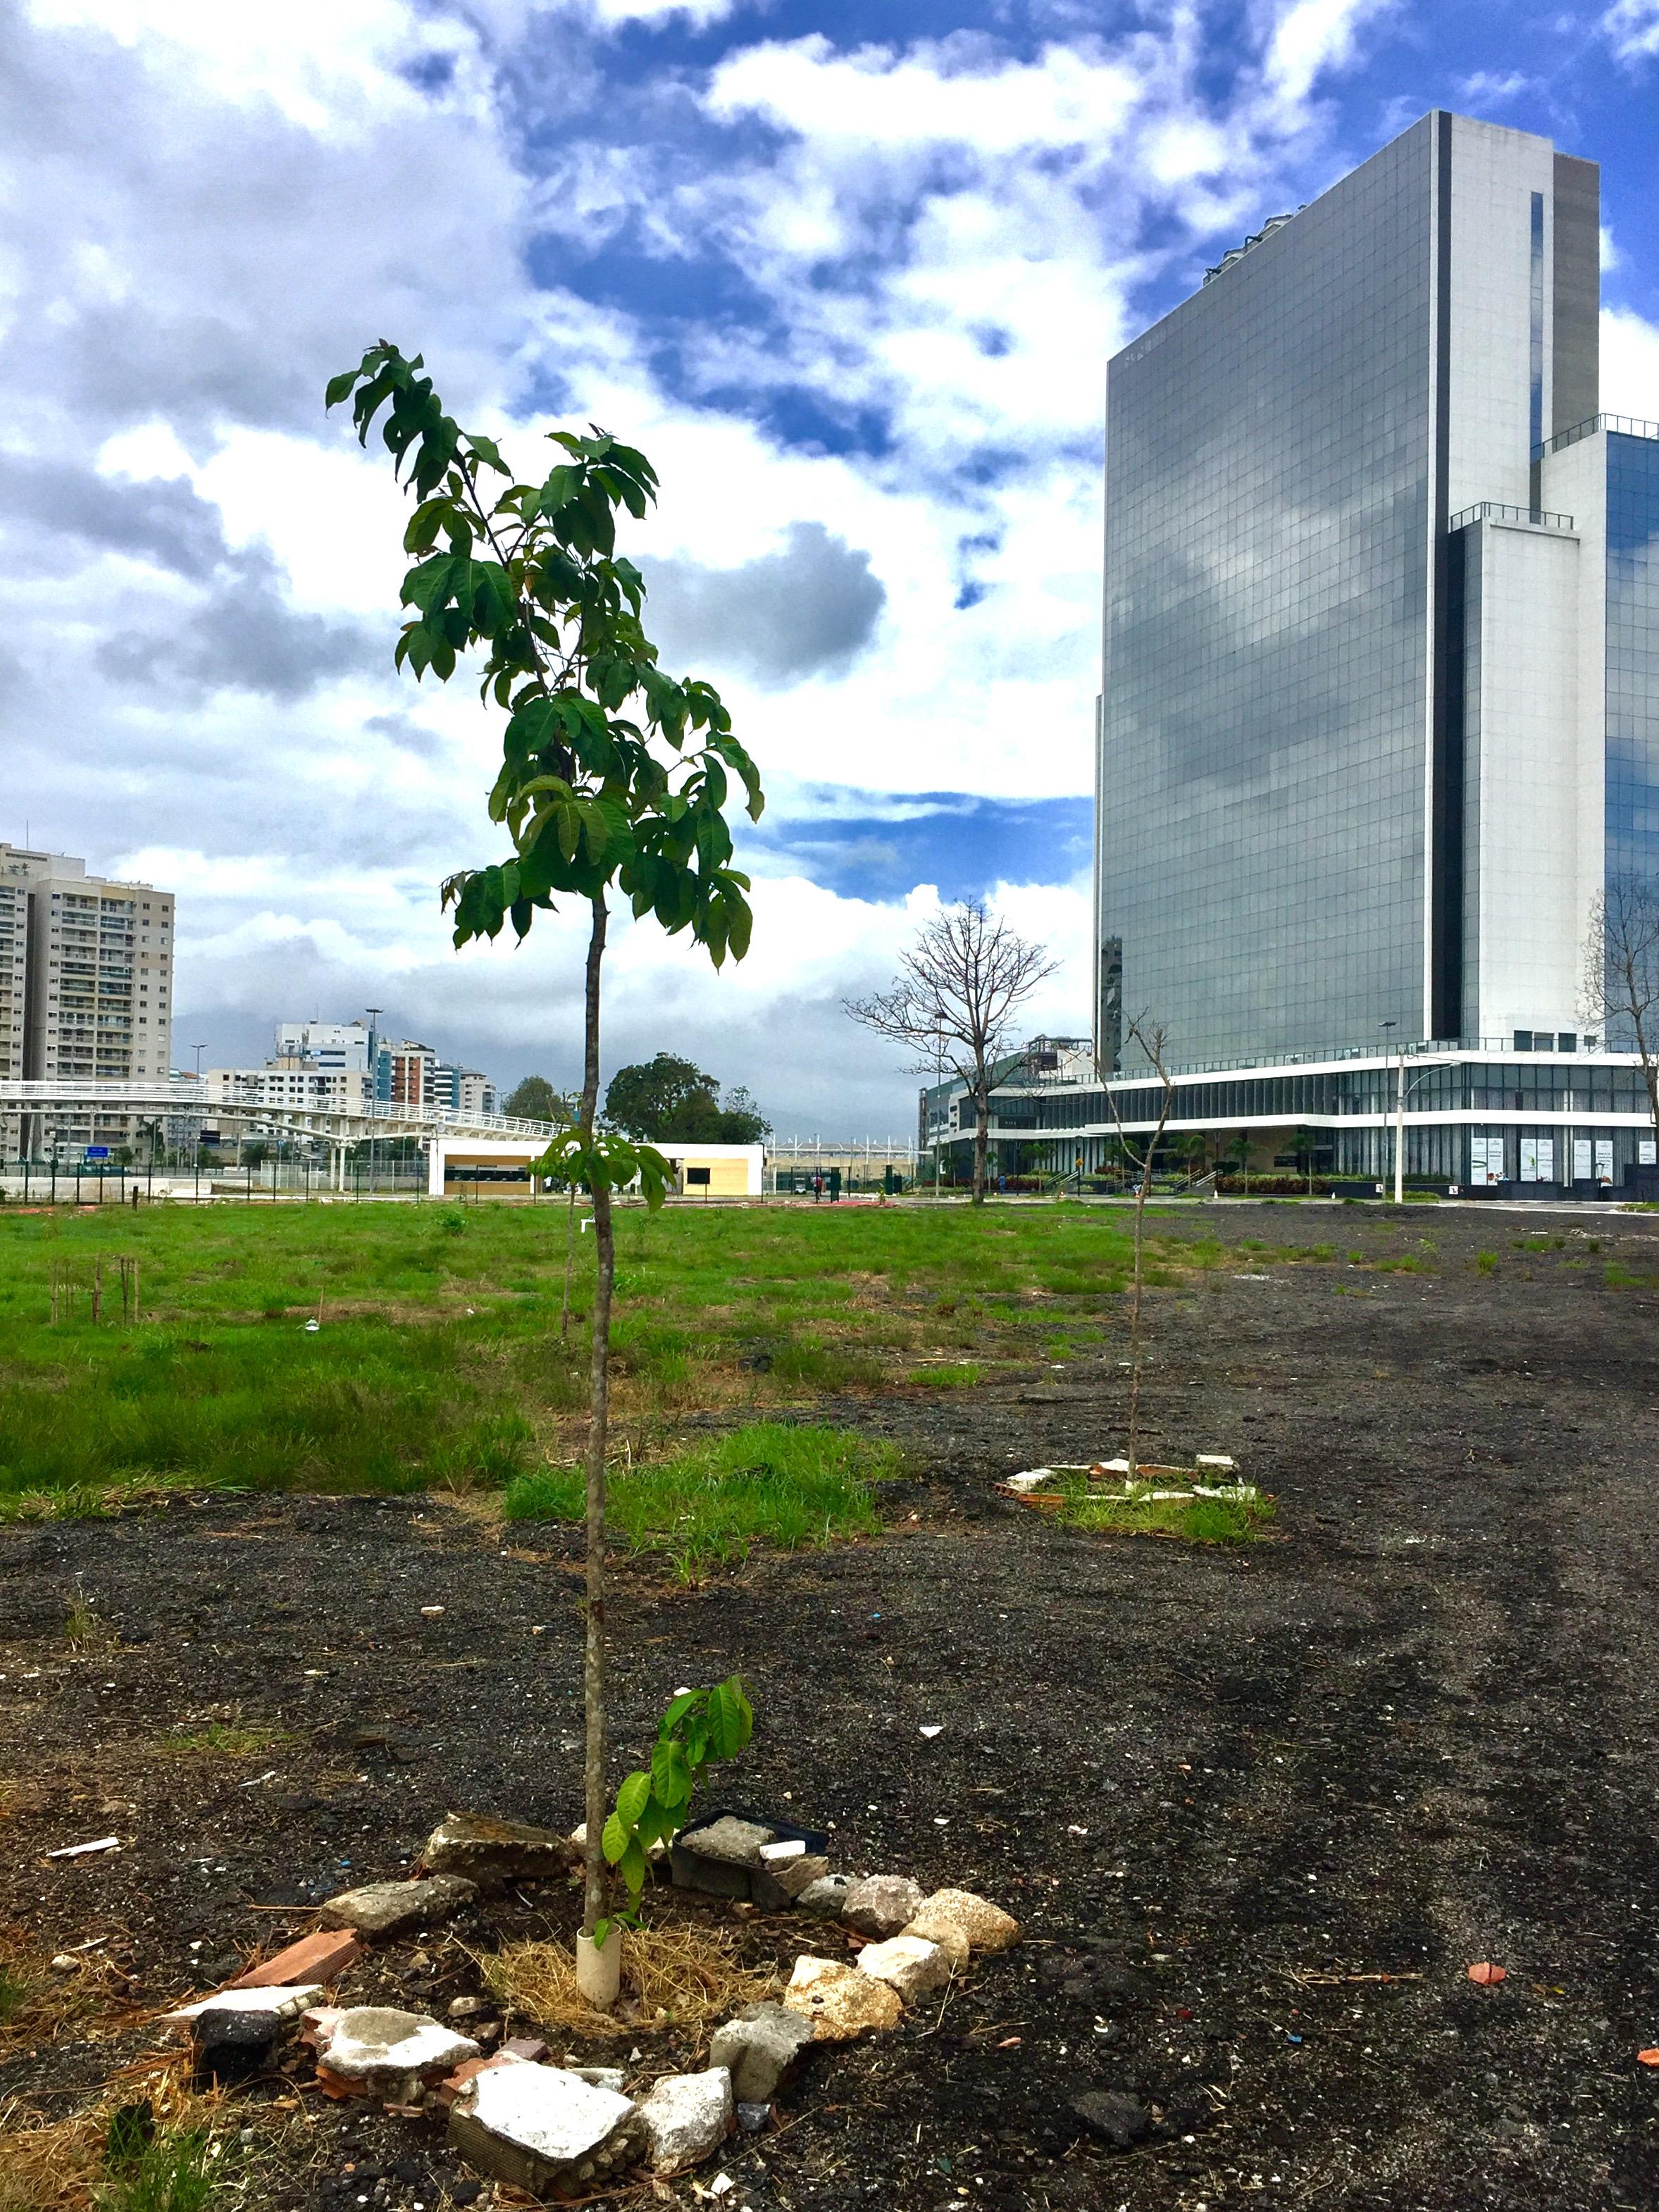 Residents are reforesting the abandoned gravel lots surrounding Vila Autódromo